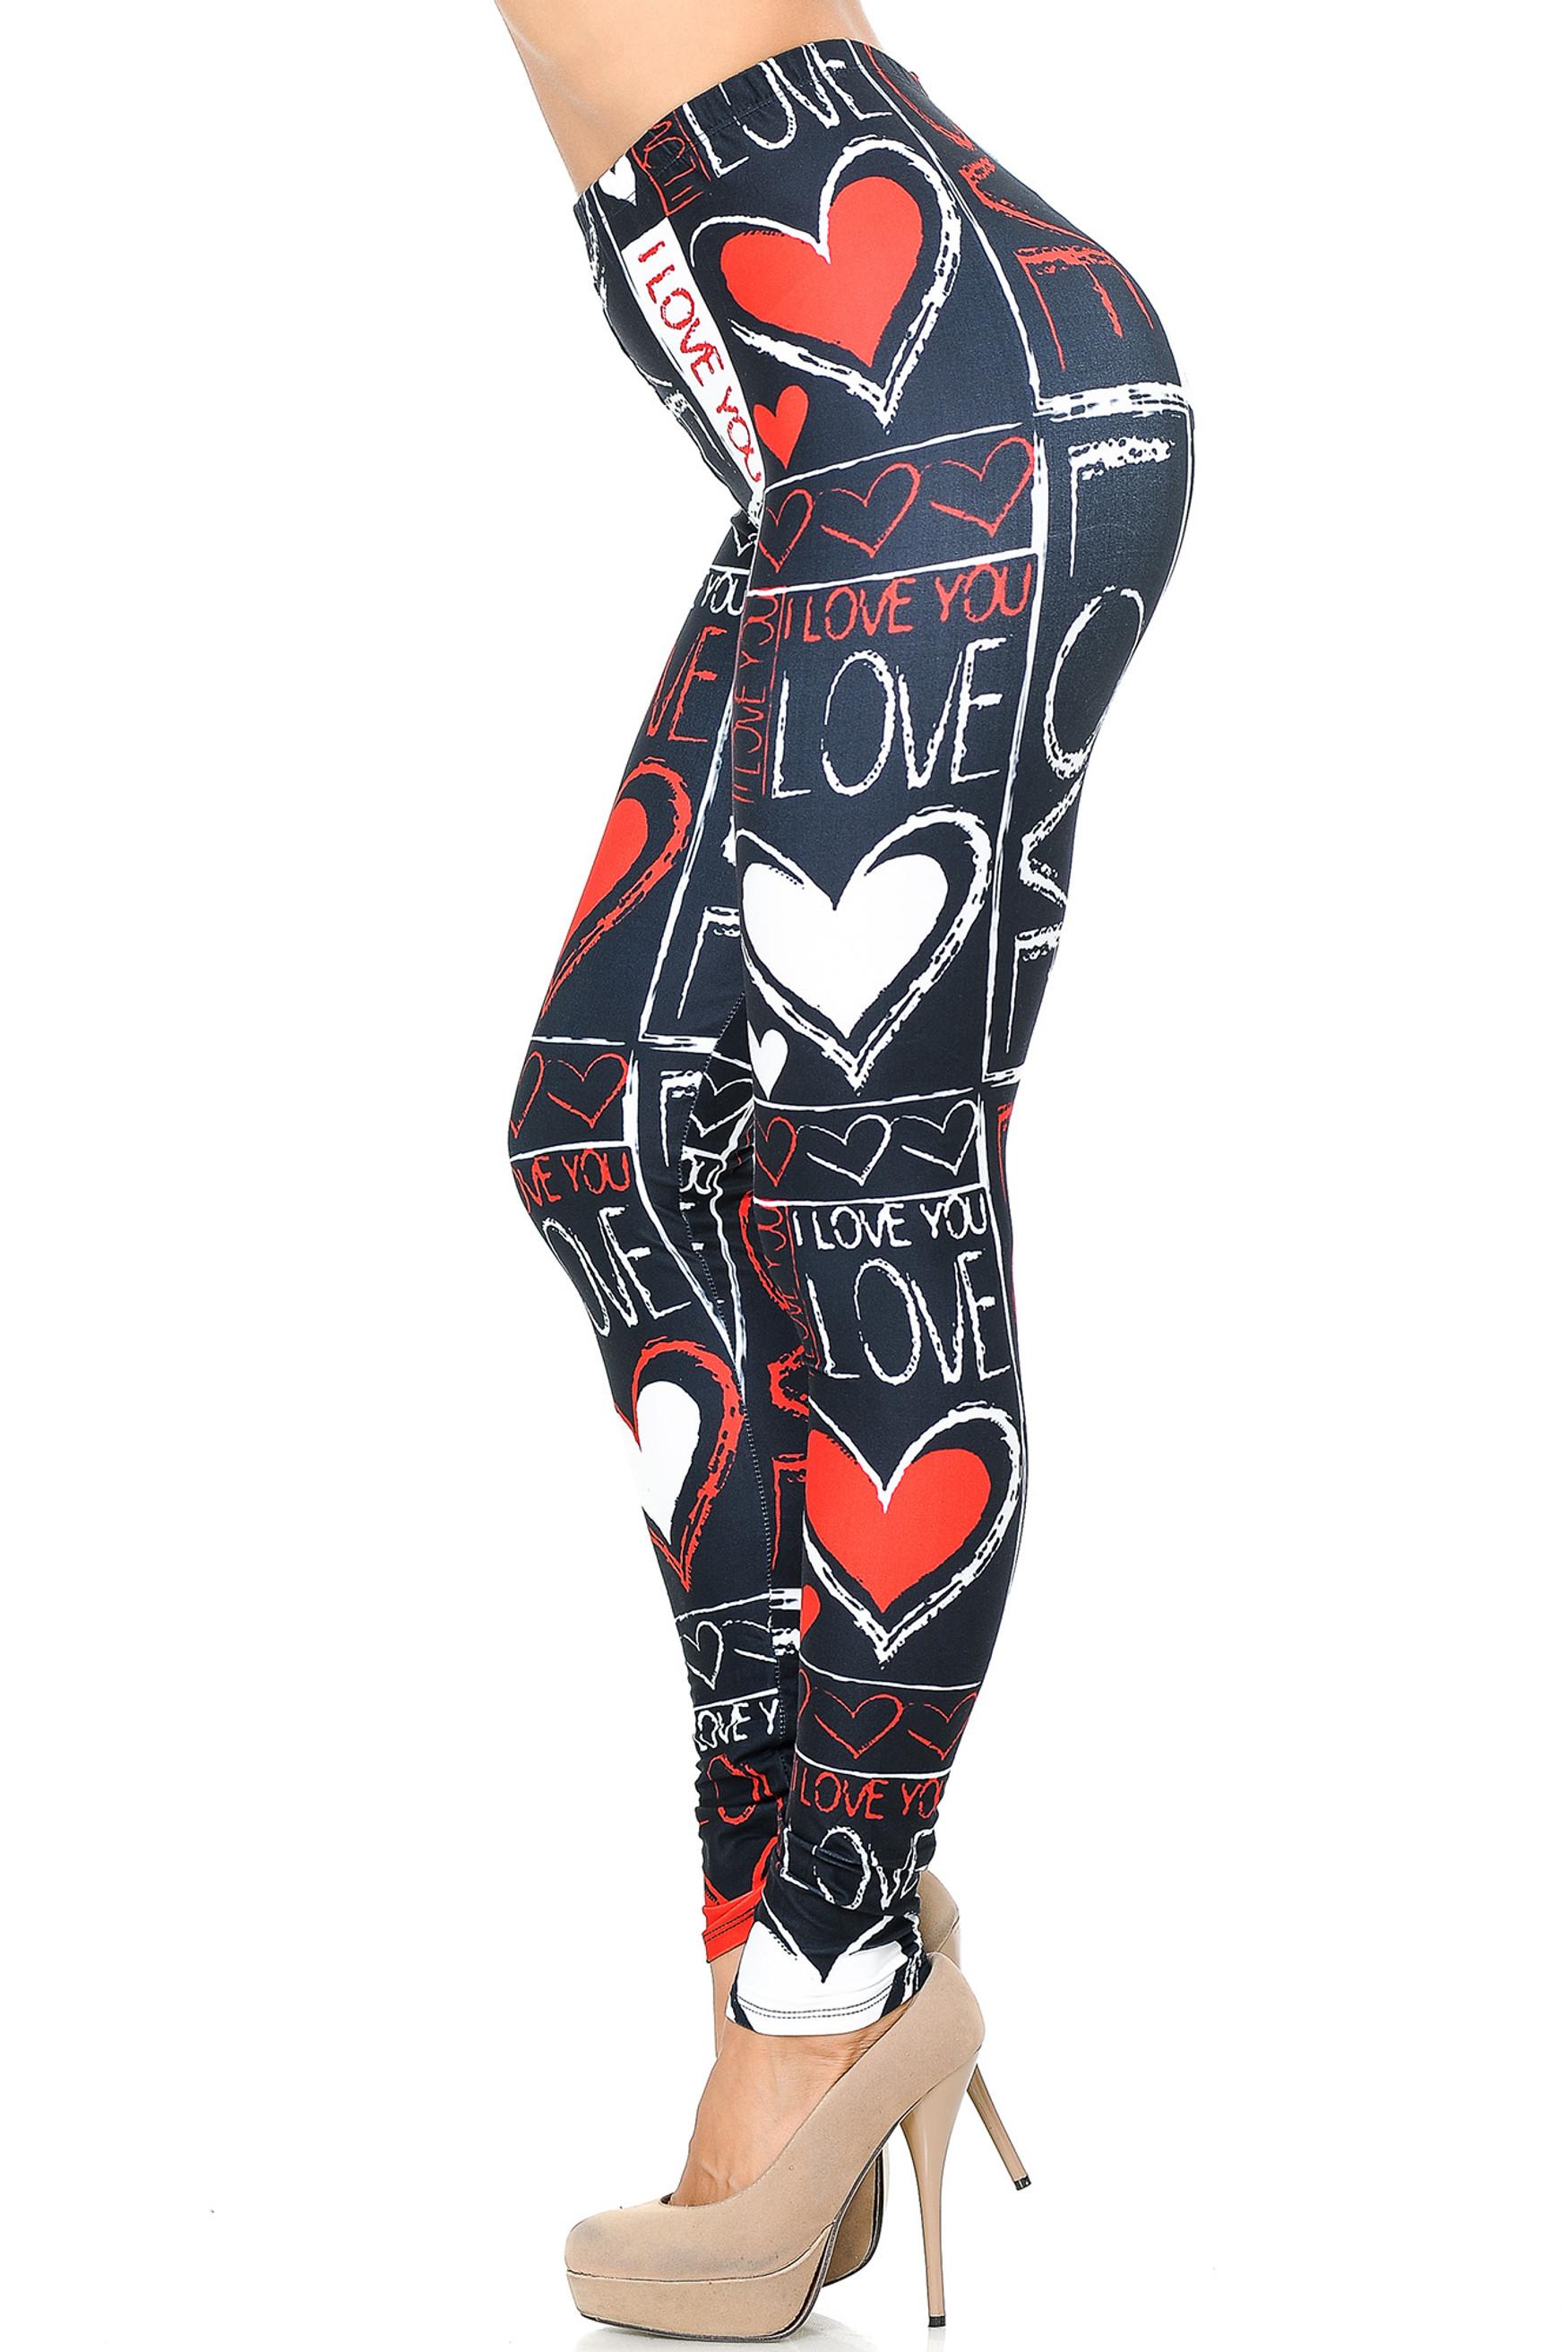 Creamy Soft Heart and Love Leggings - USA Fashion™